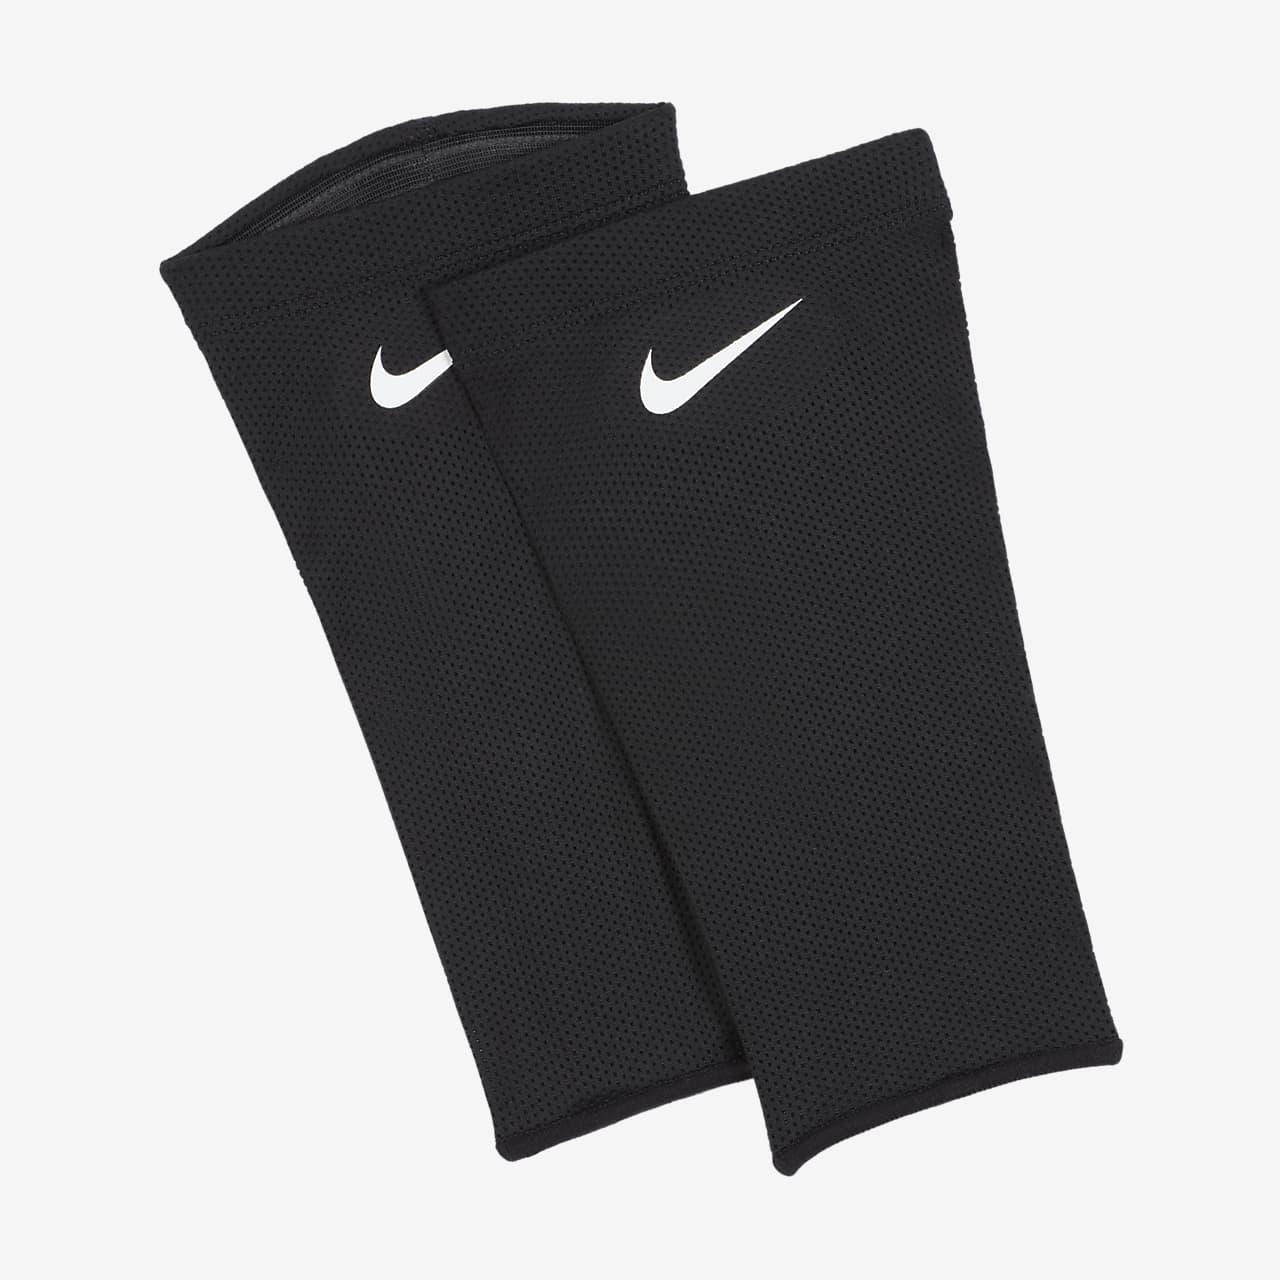 Nike Guard Lock Elite Football Sleeves